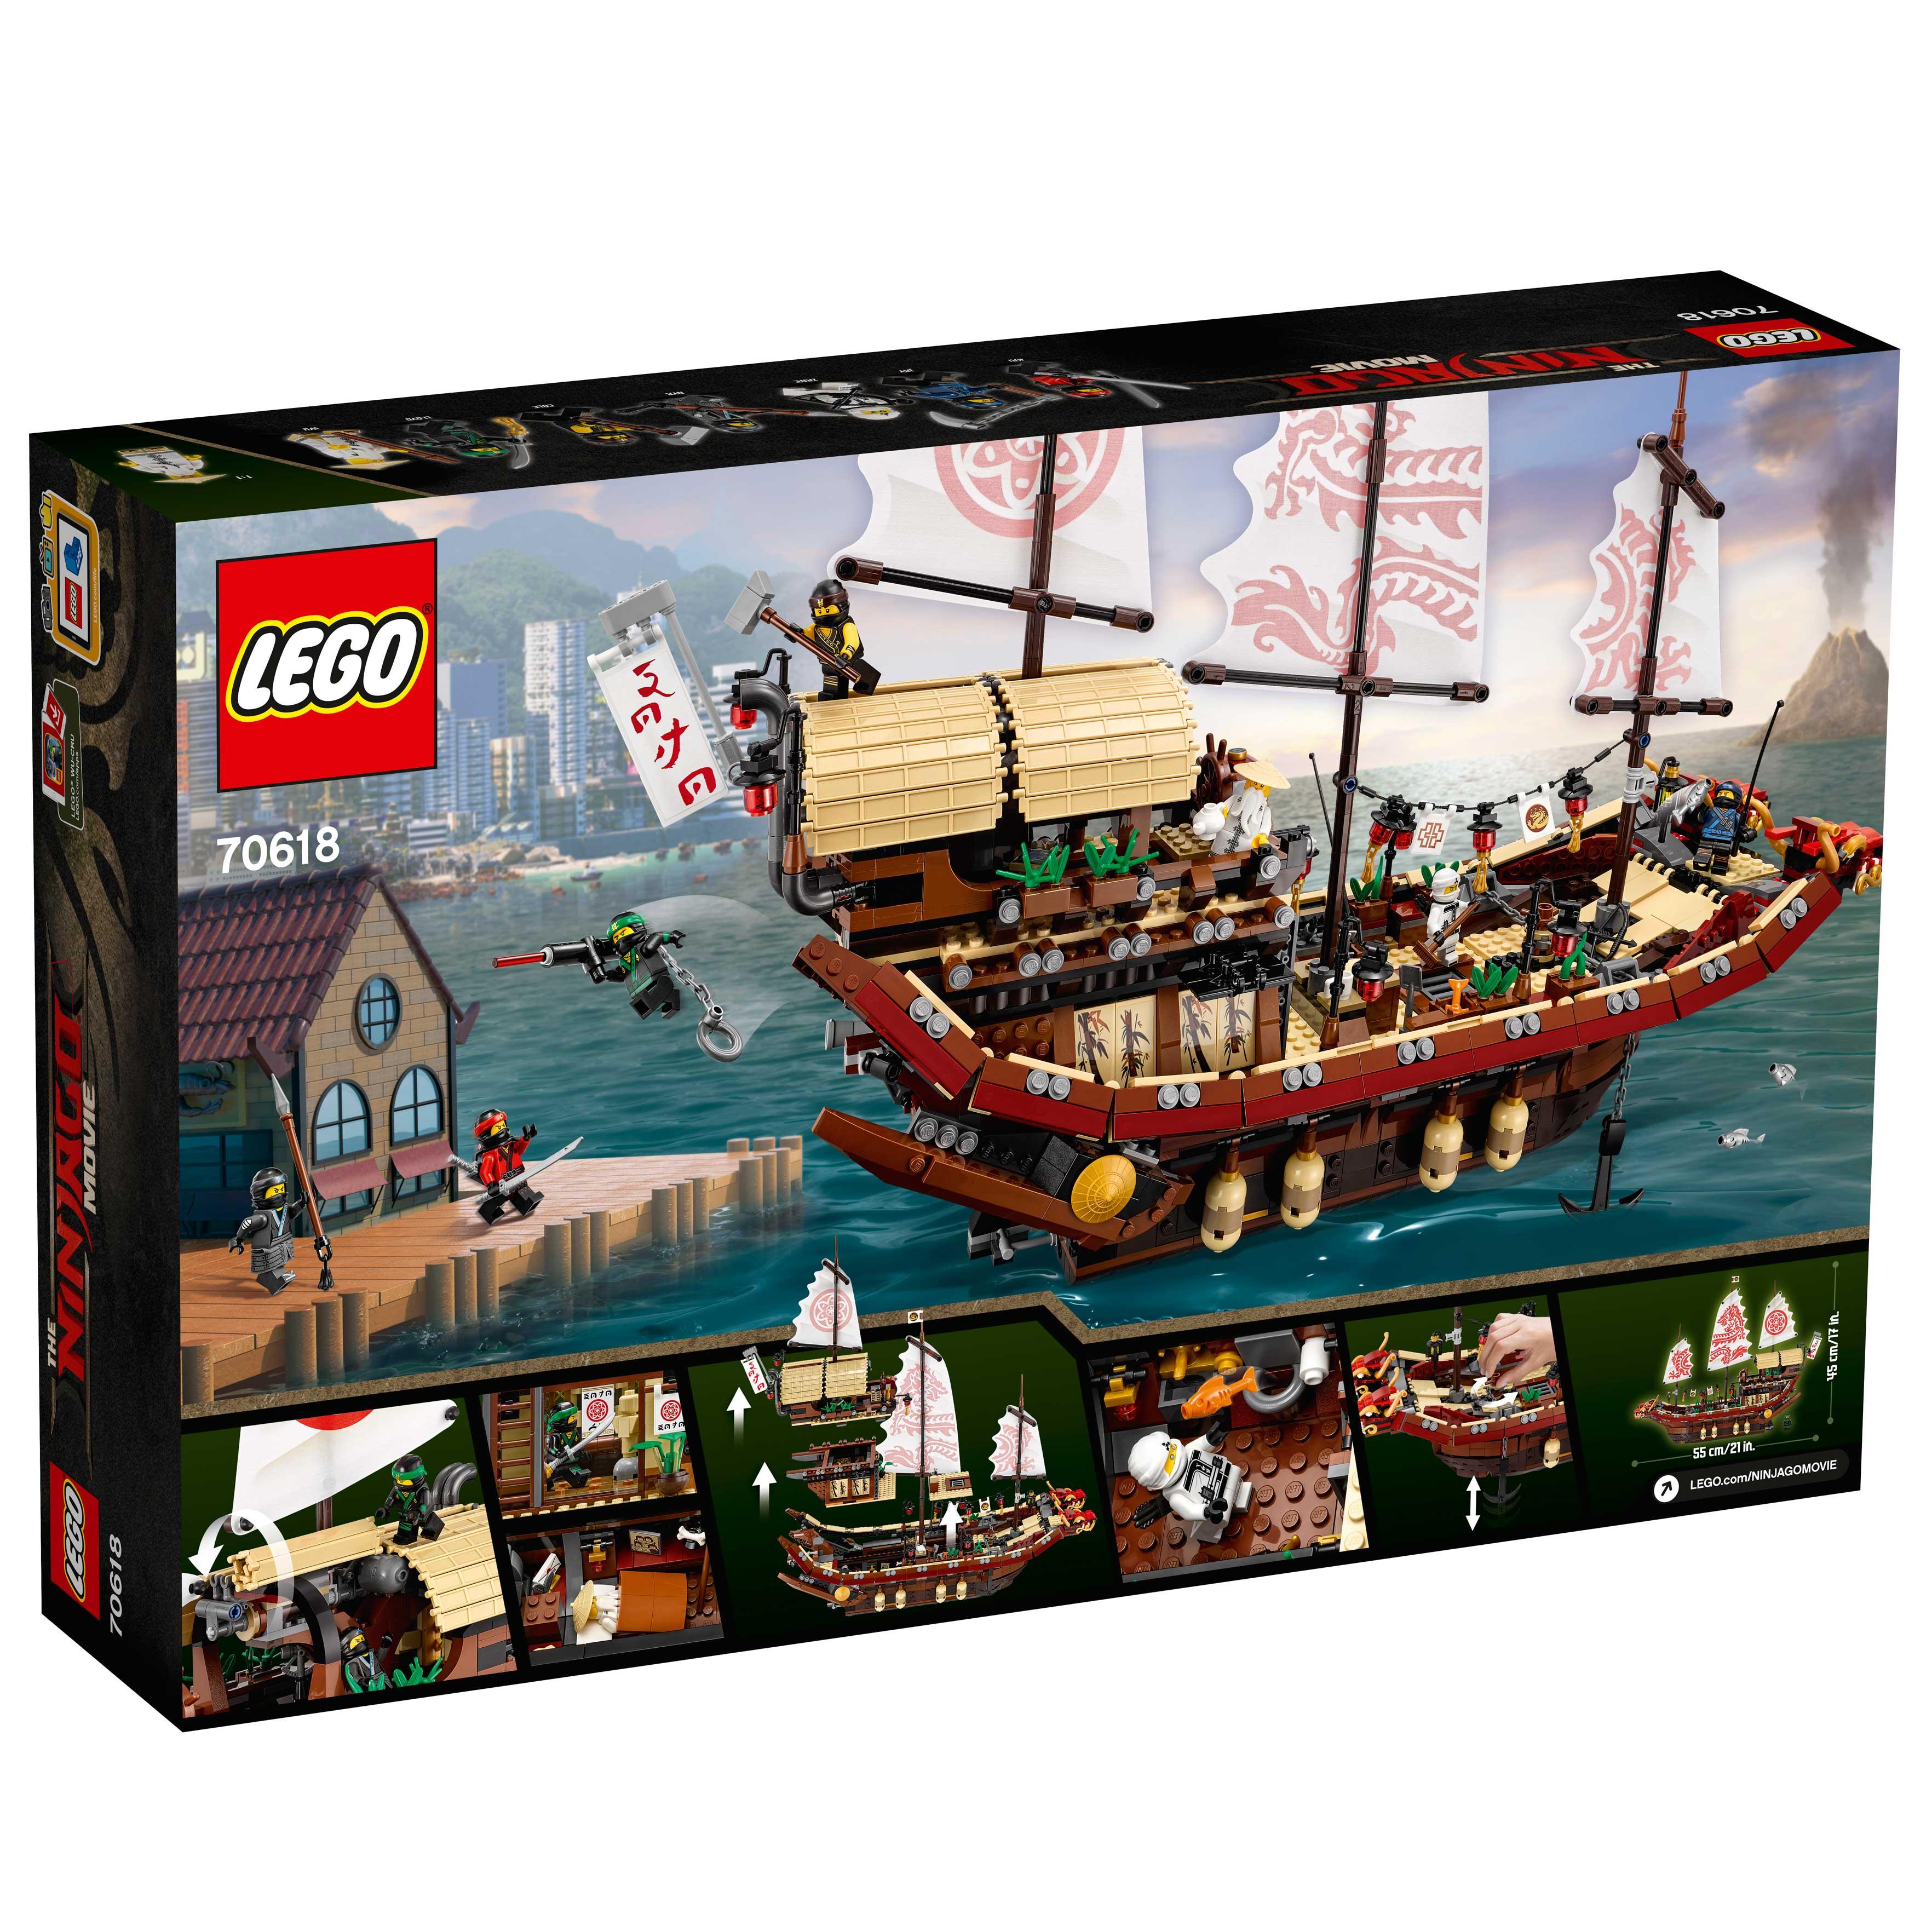 flying - Legocom Ninjago